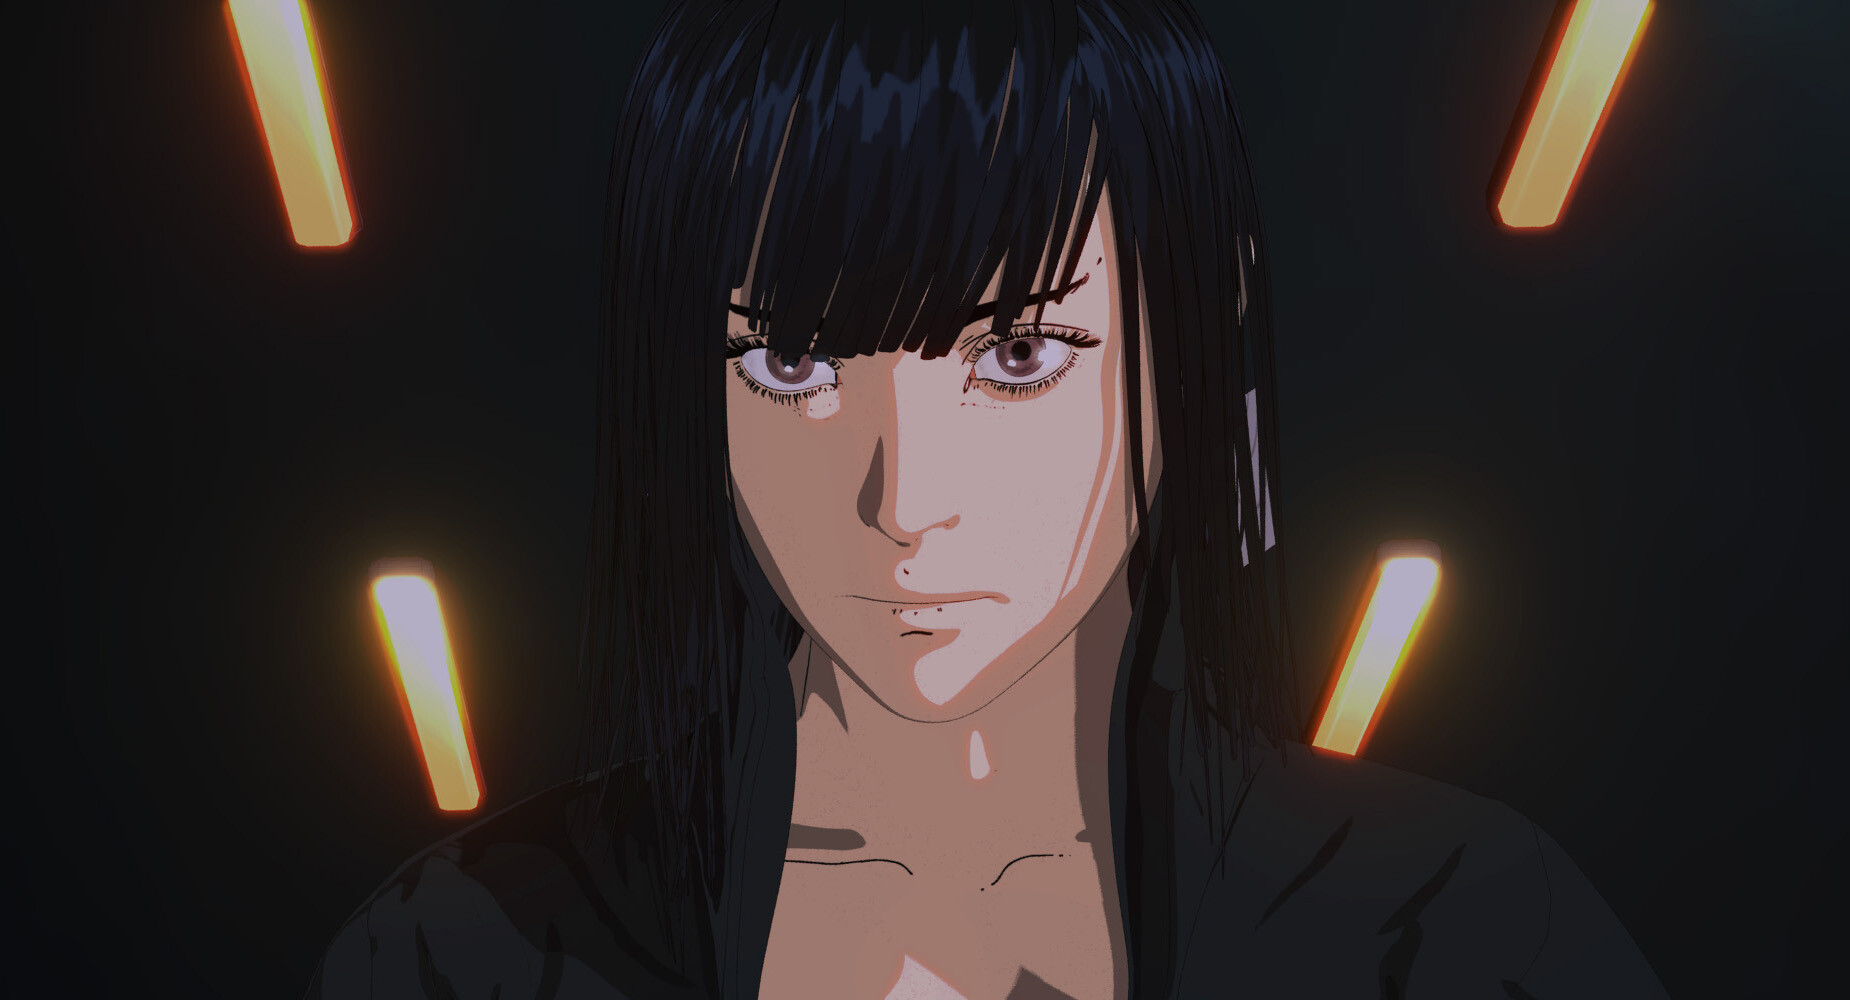 Maciej kuciara anime shader 2019 01